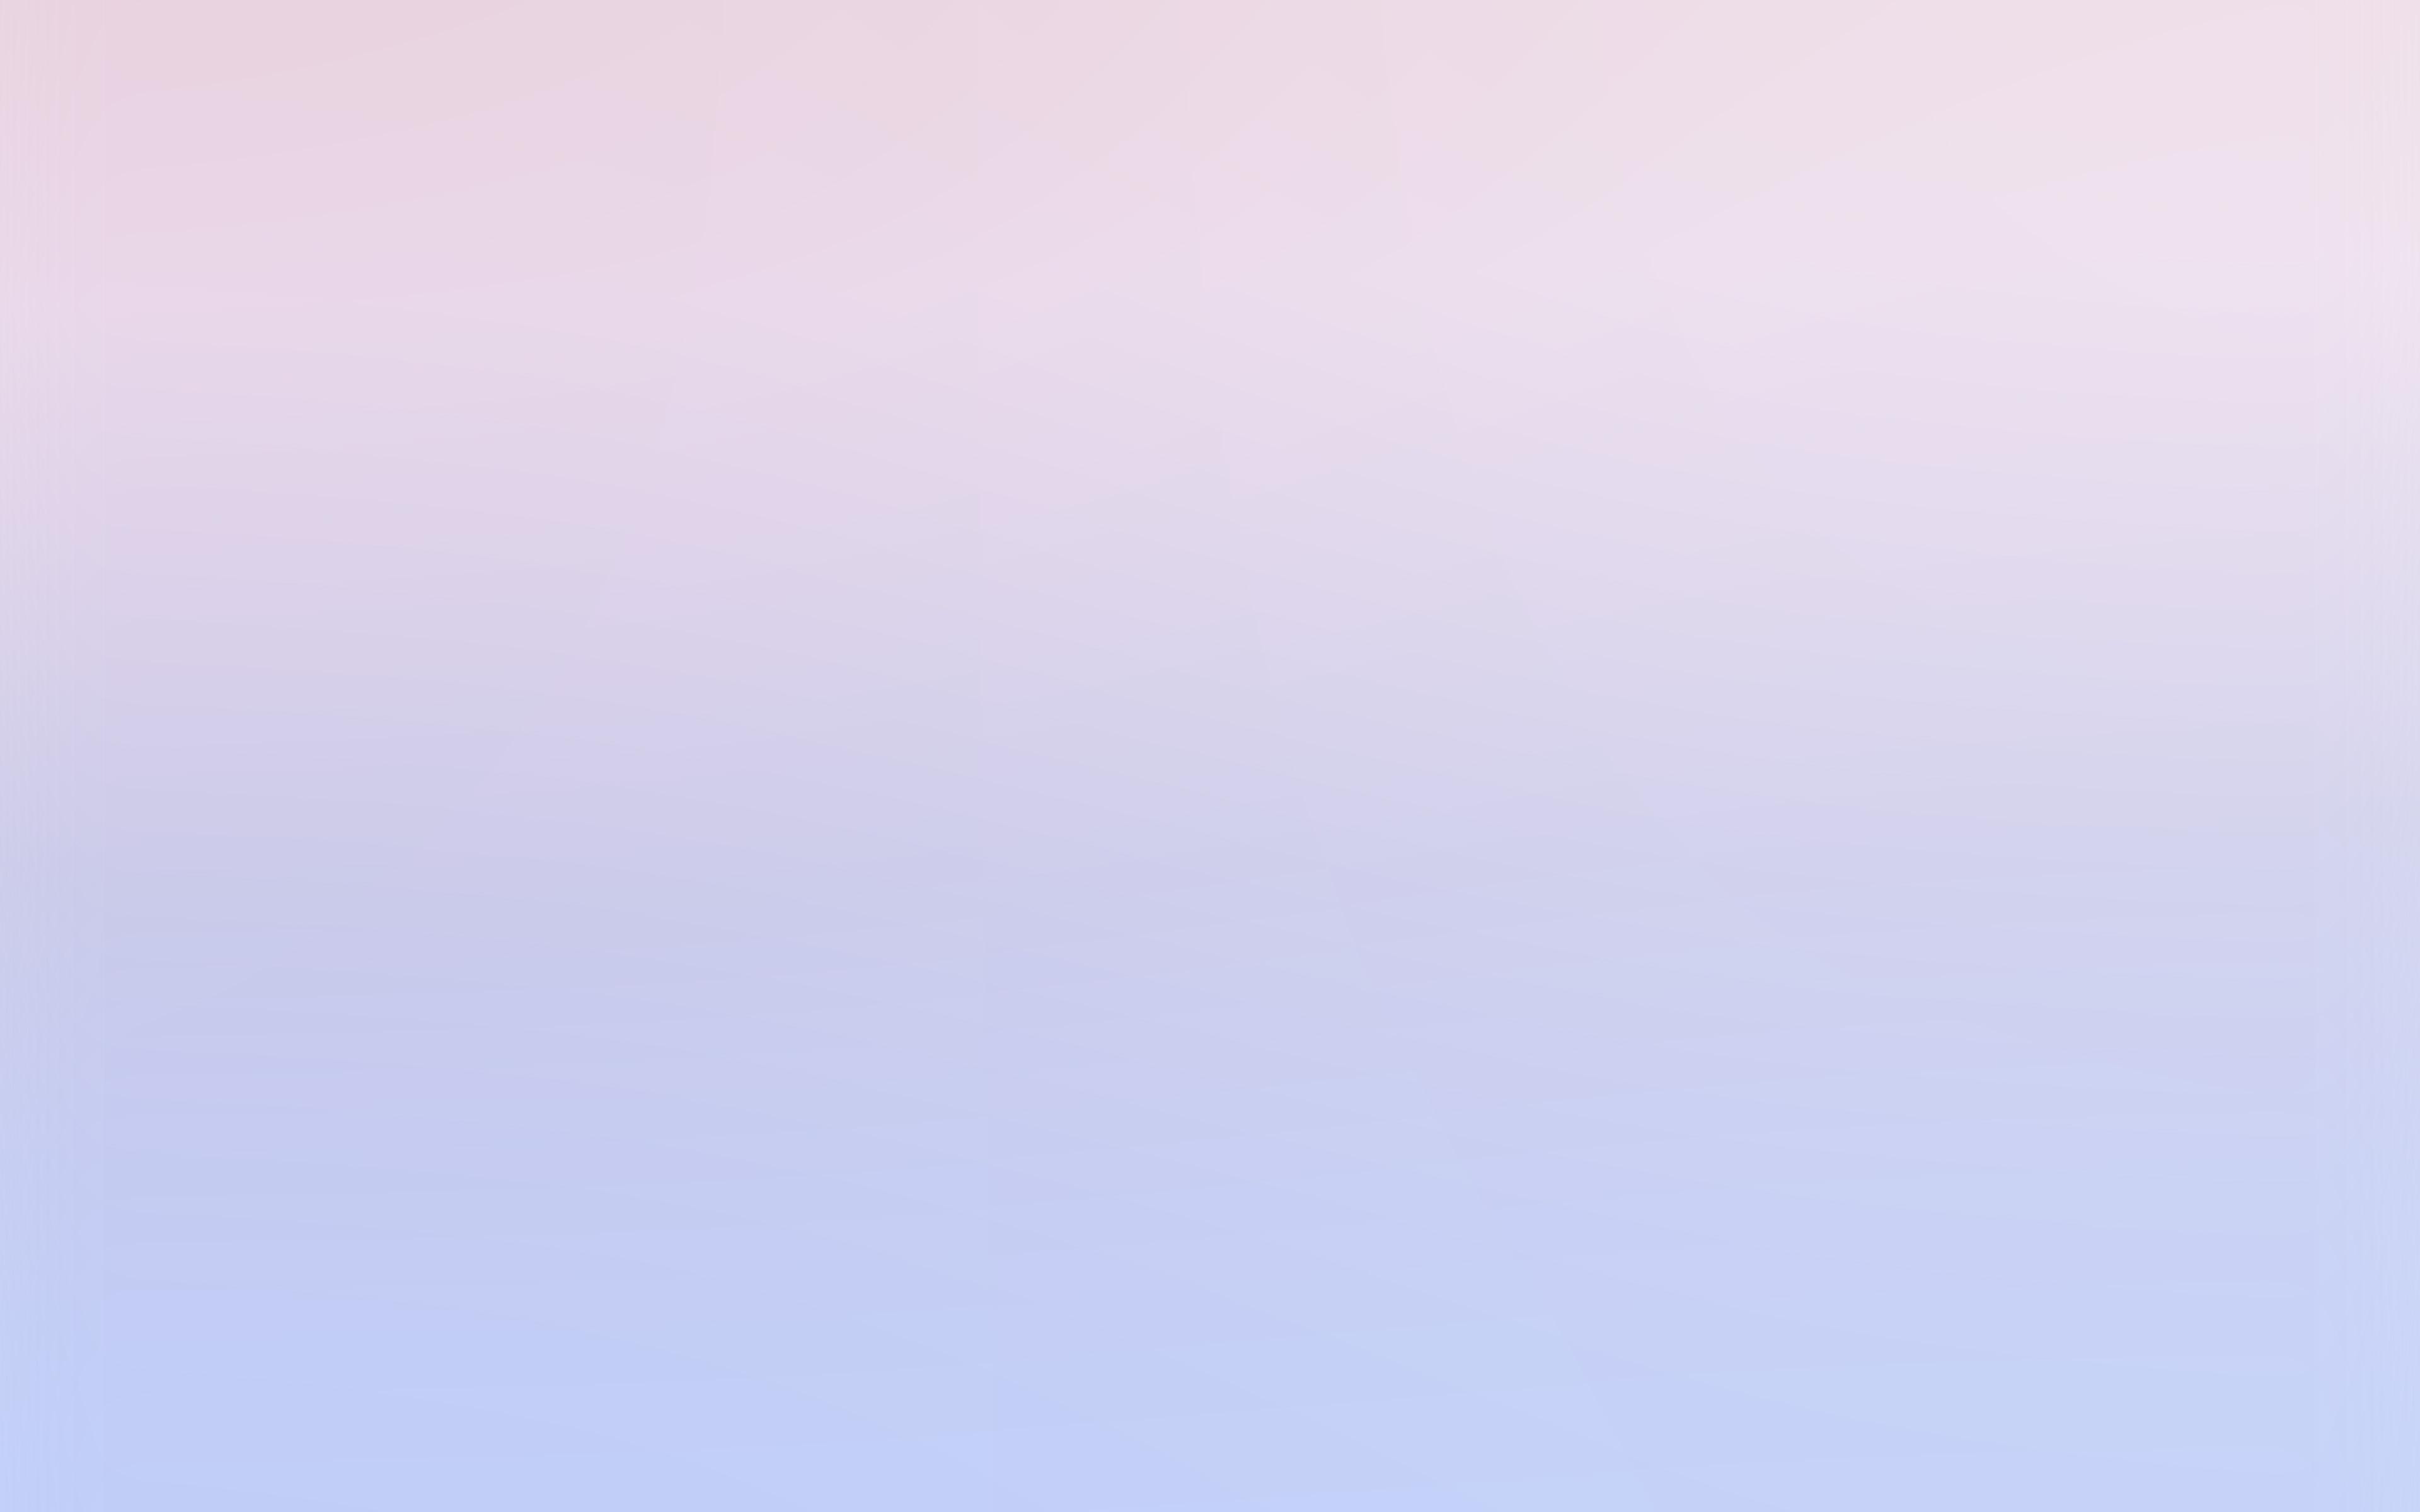 Sm55 Pastel Blue Red Morning Blur Gradation Wallpaper